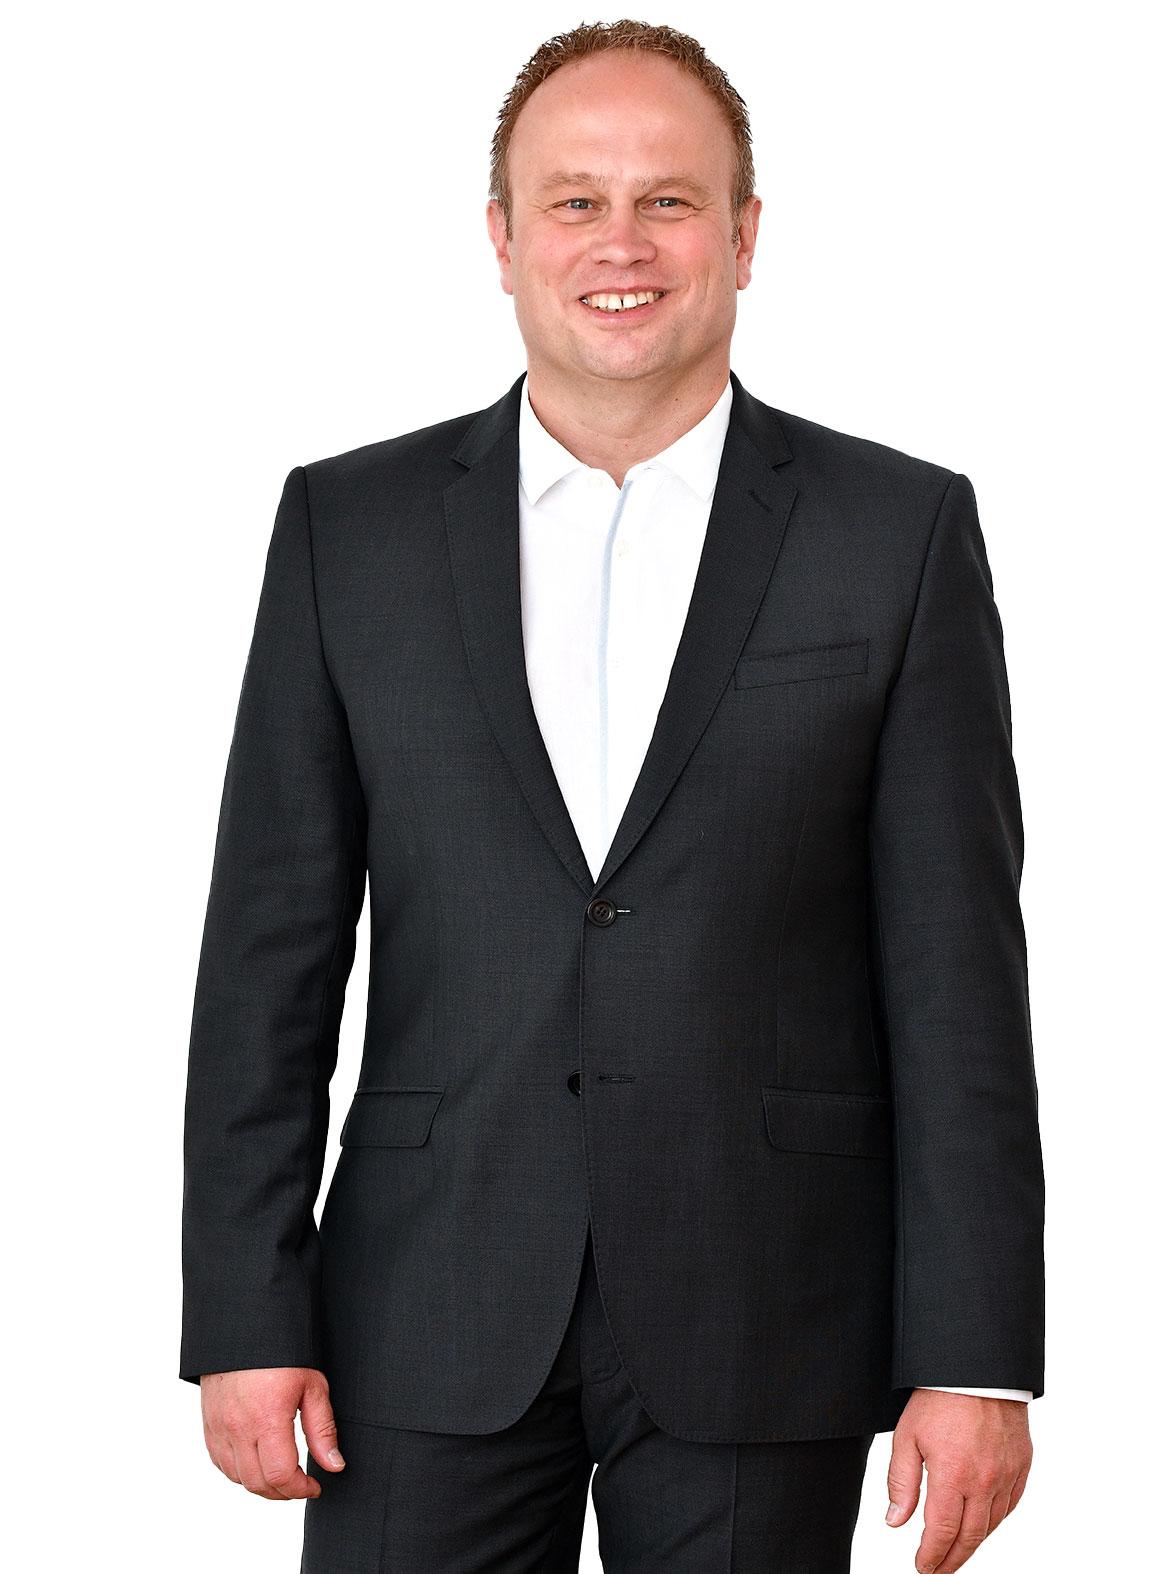 Michael Skrzeba